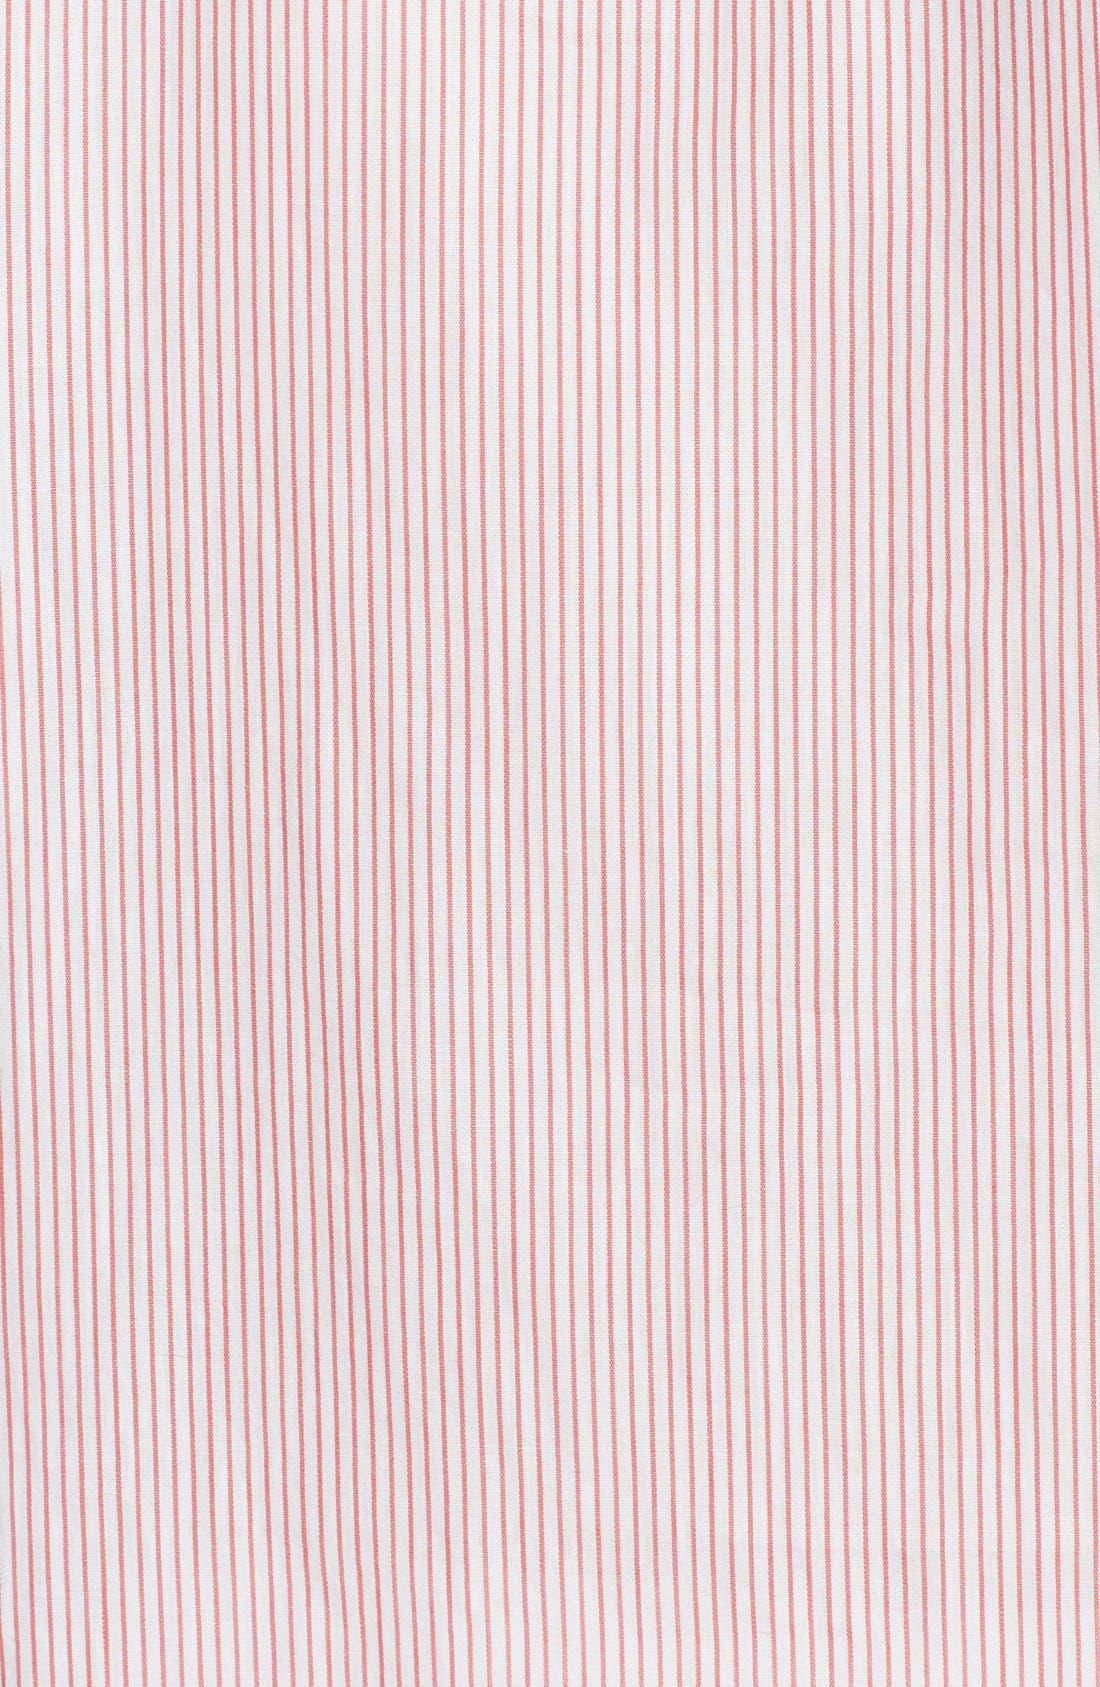 Alternate Image 3  - Equipment 'Brett' Stripe Cotton Shirt